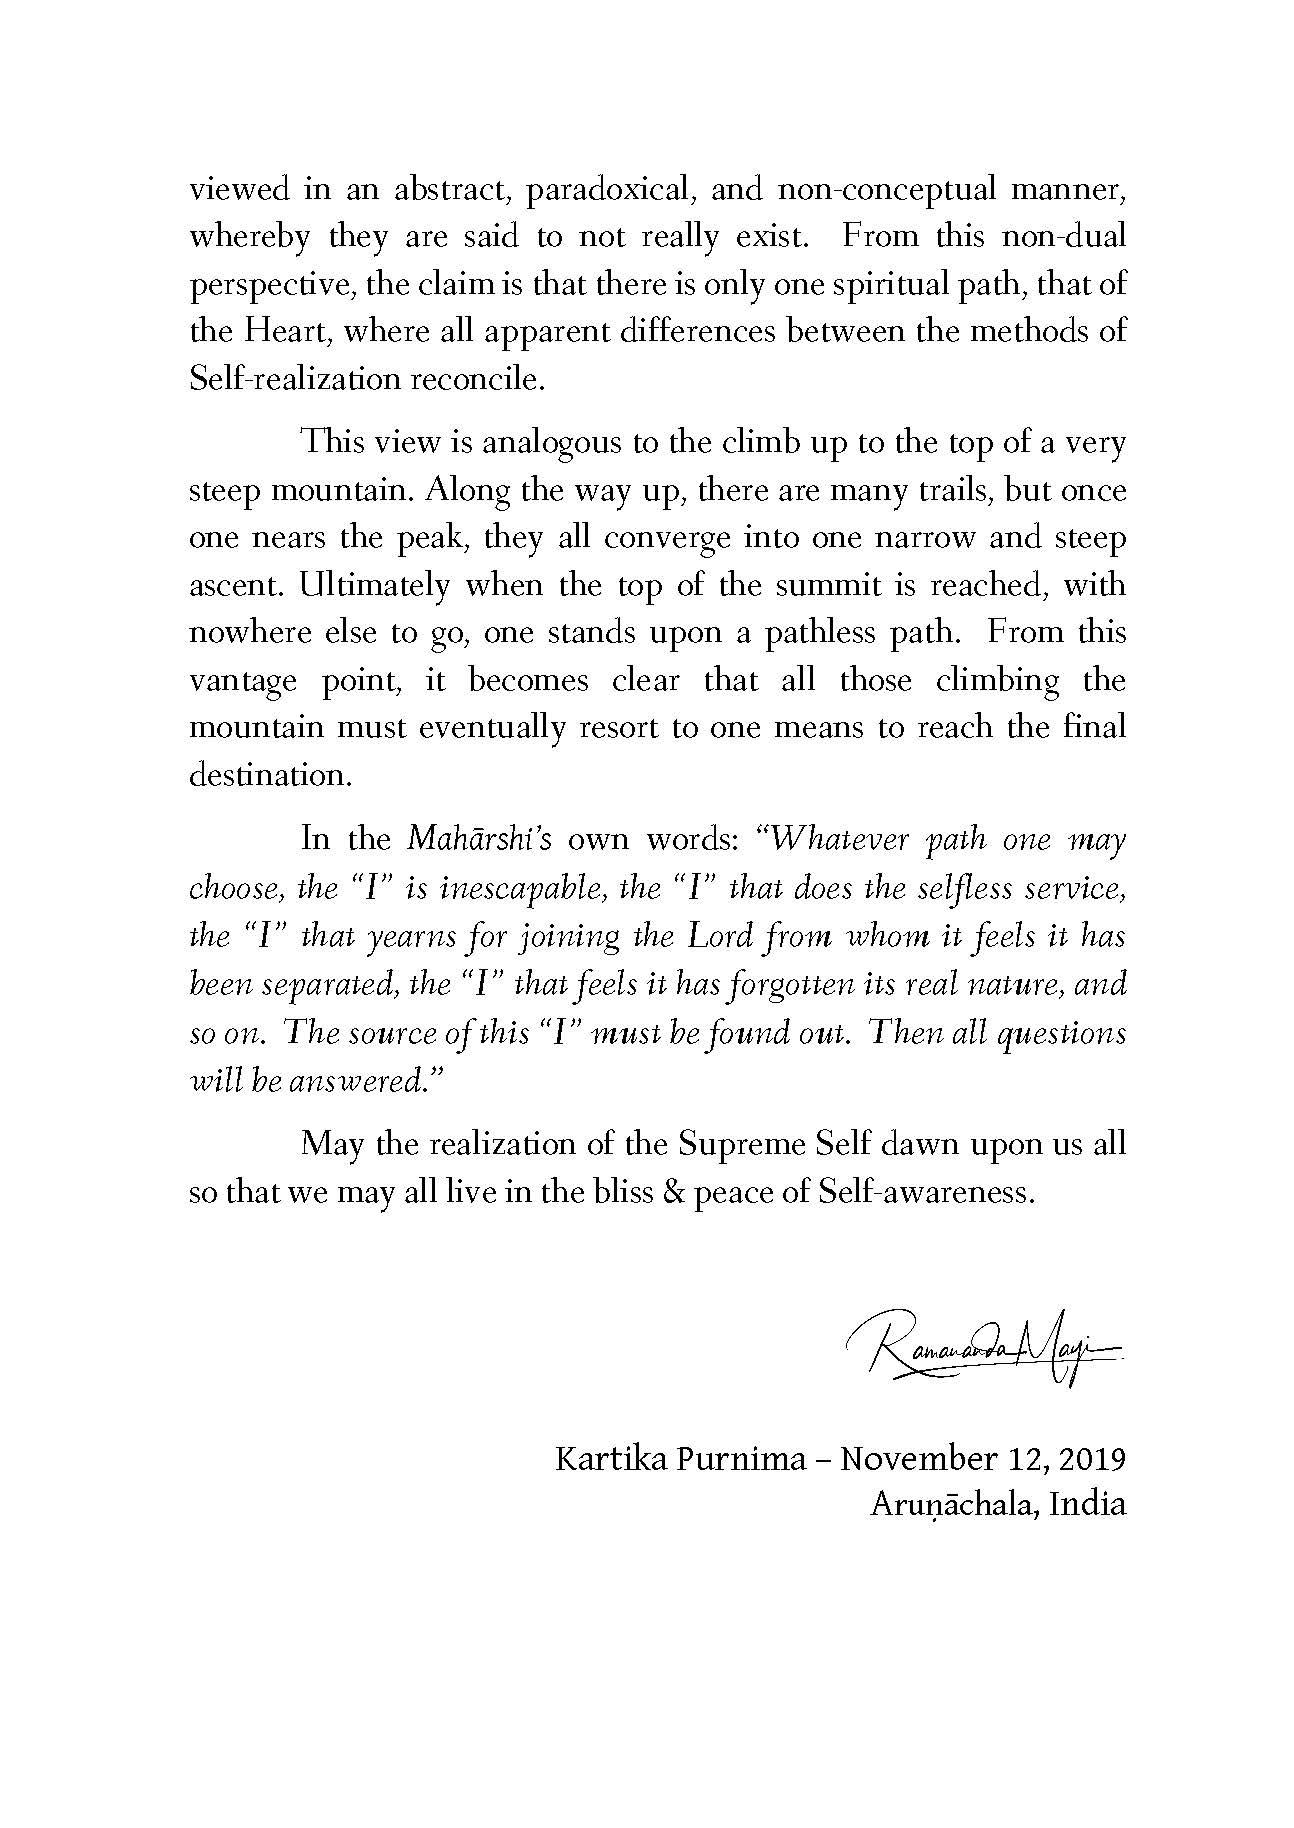 Awakening the Bliss of Being - PDF Download_Page_010